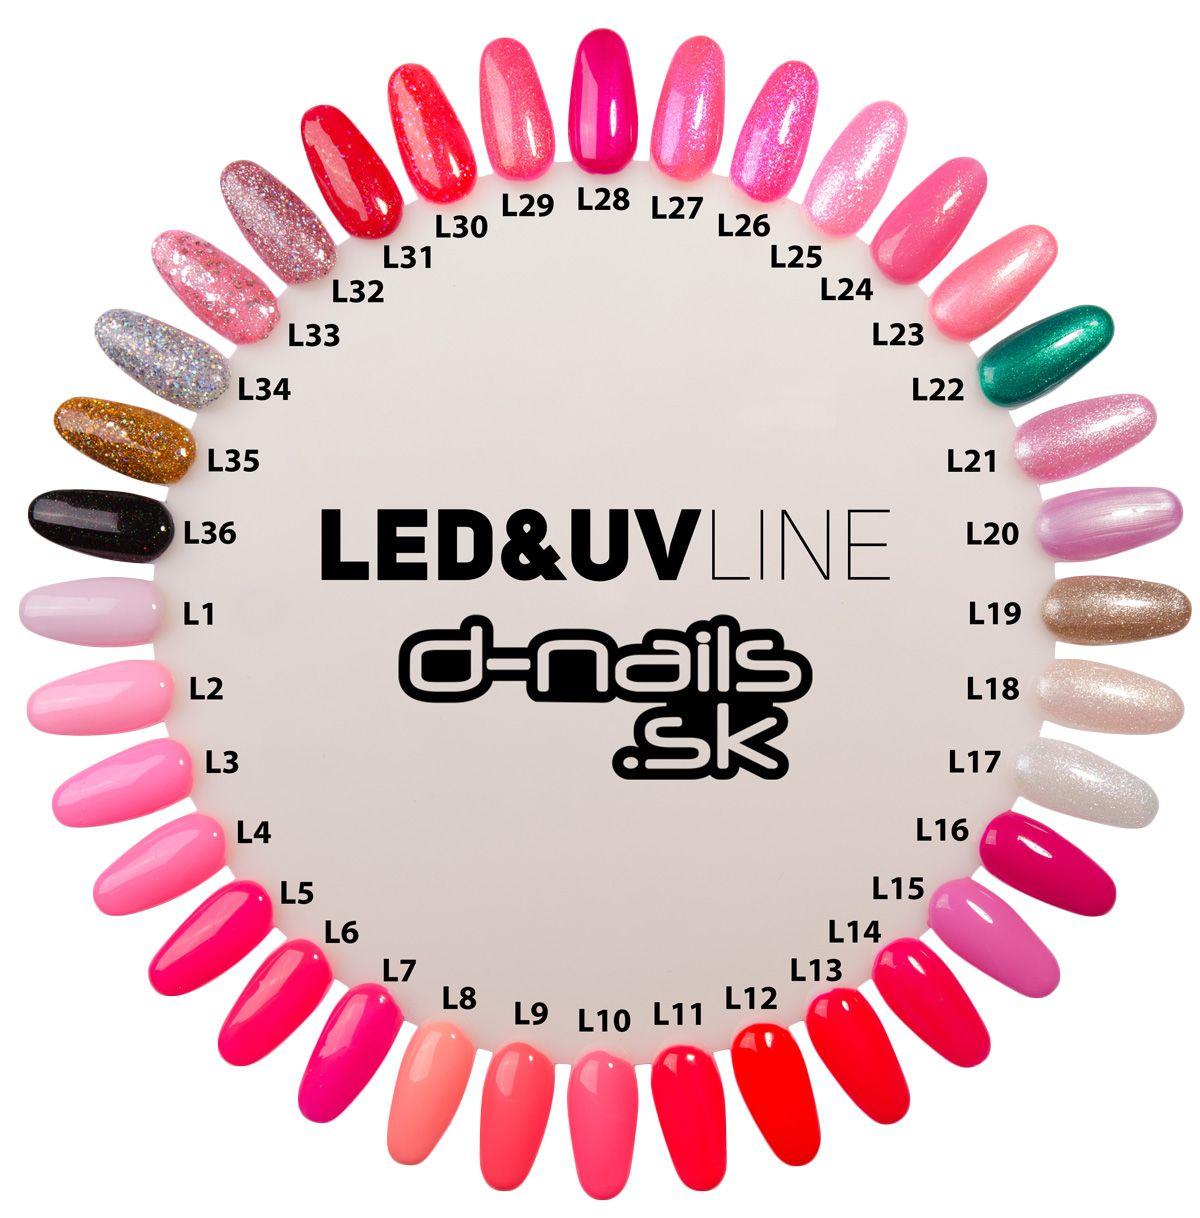 Barevny Led Gel A Uv Gel 006 5ml Magic Nails Gelove Nehty Gelove Nehty Nehty Lak